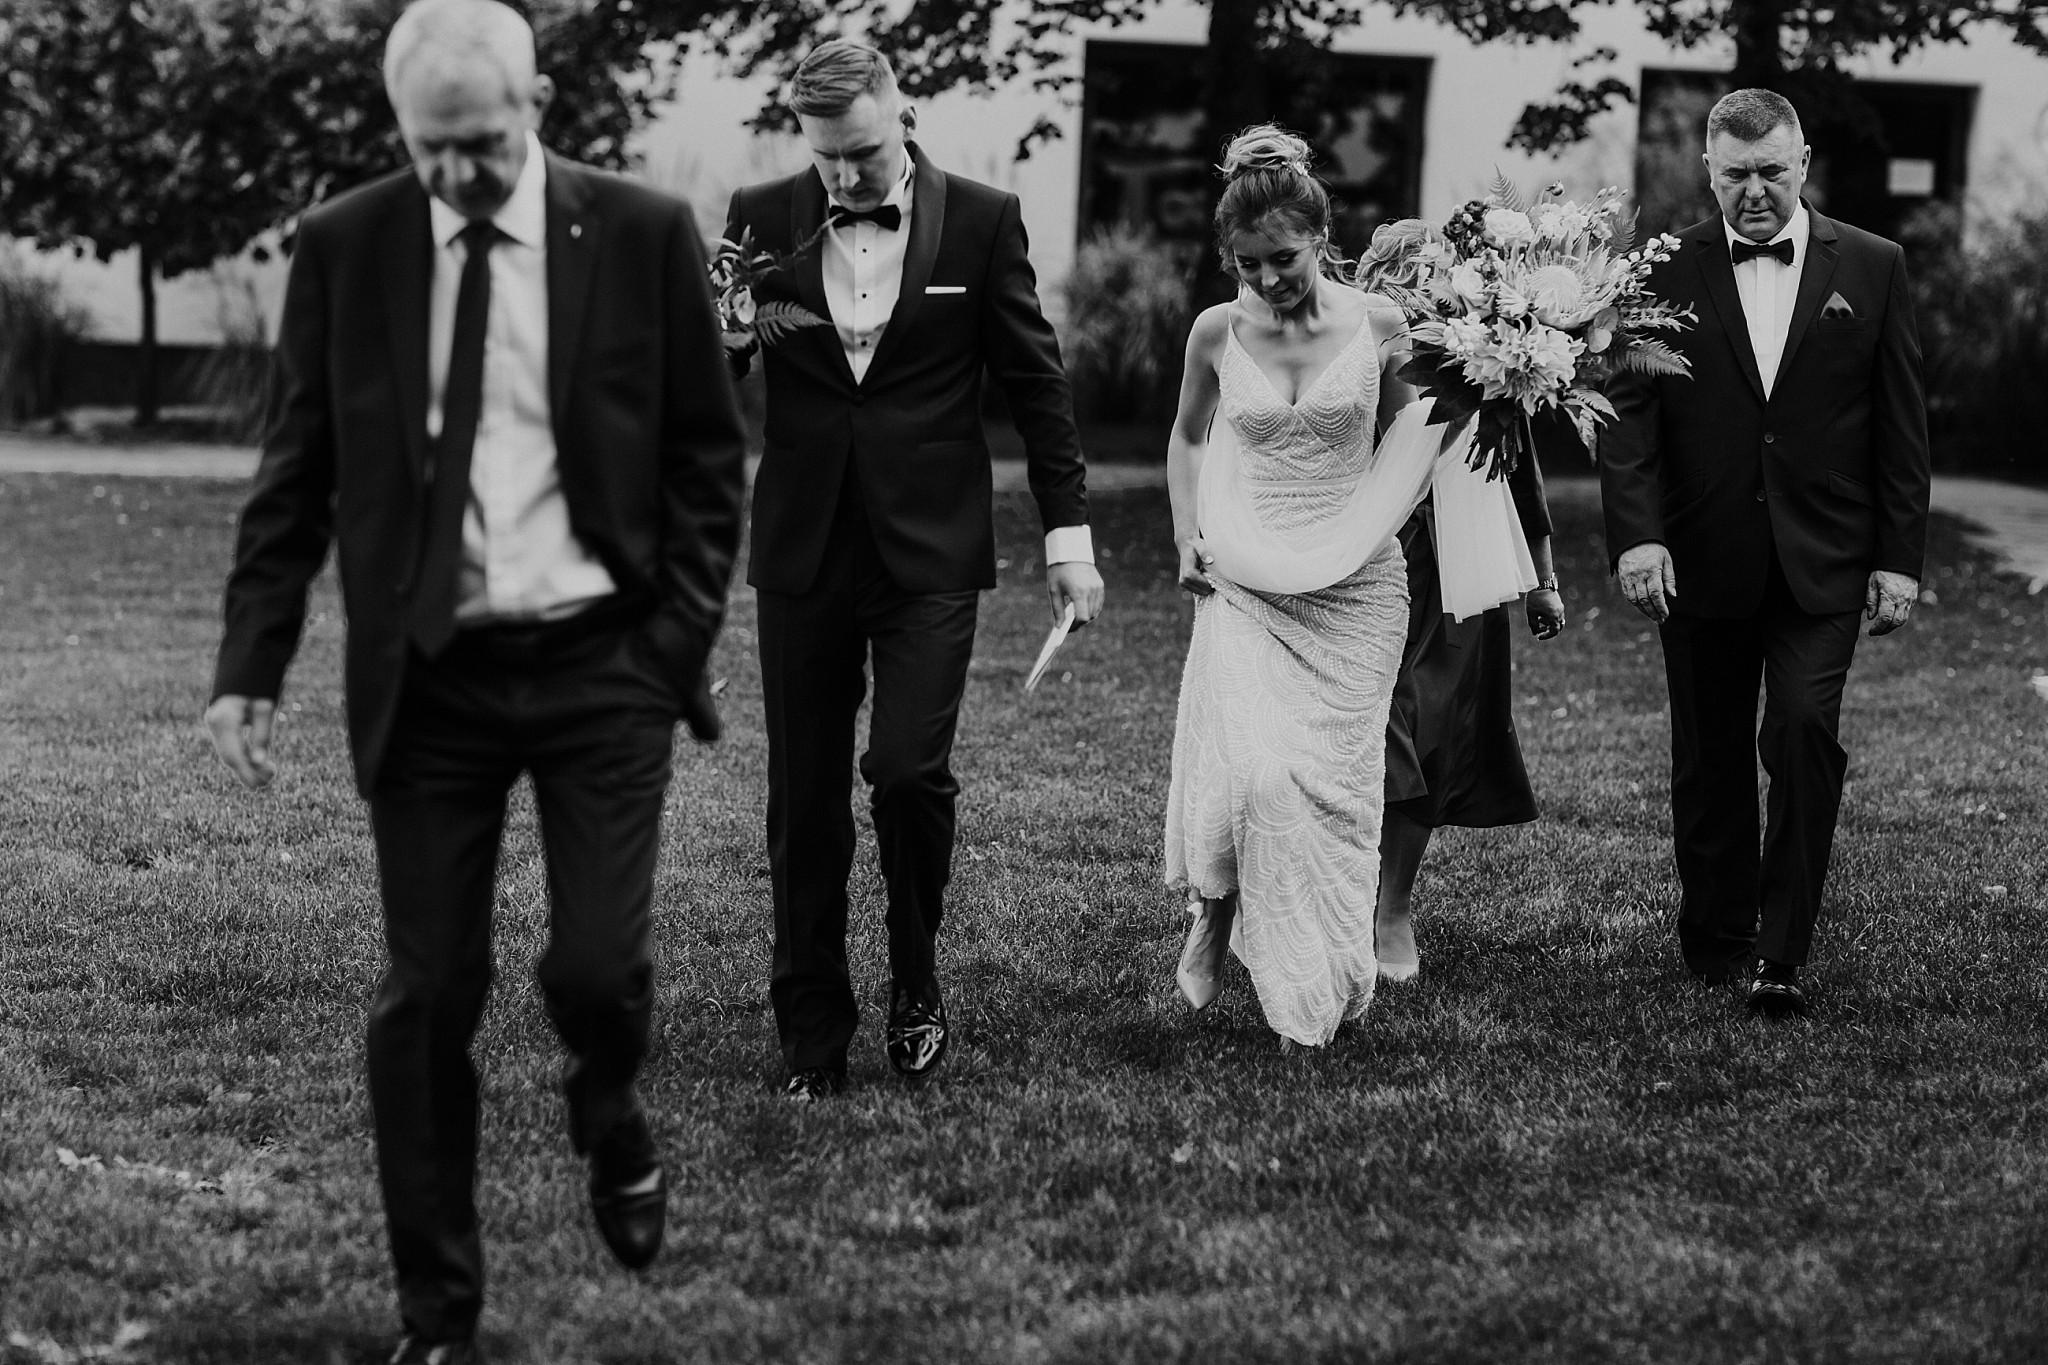 fotograf poznan wesele dobra truskawka piekne wesele pod poznaniem wesele w dobrej truskawce piekna para mloda slub marzen slub koronawirus slub listopad wesele koronawirus 092